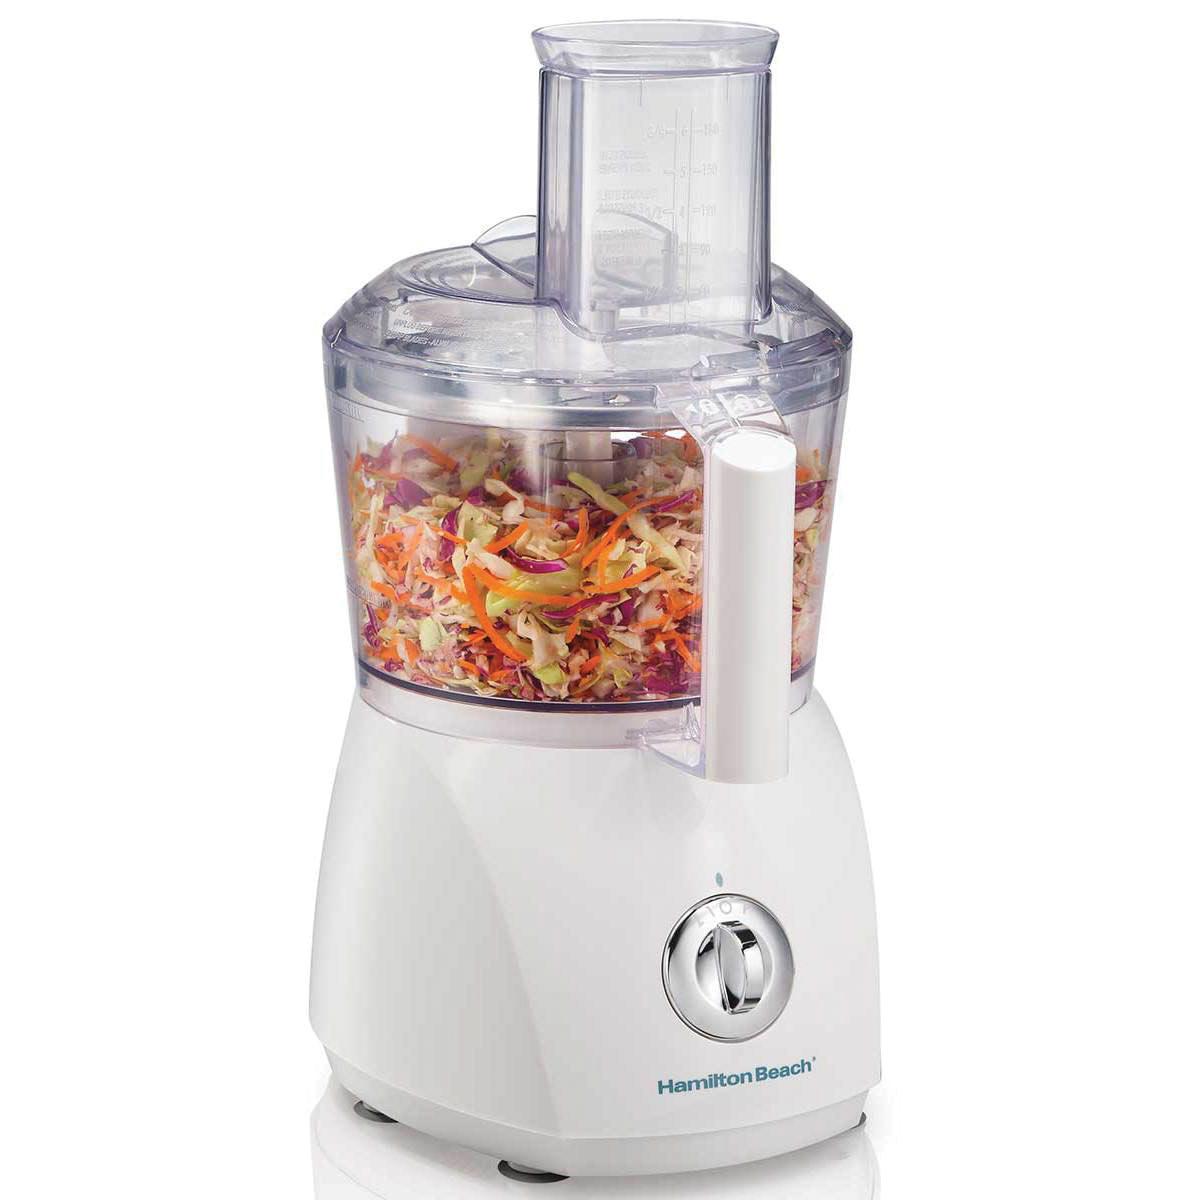 Hamilton Beach ChefPrep 500 Watt 10 Cup Food Processor - White